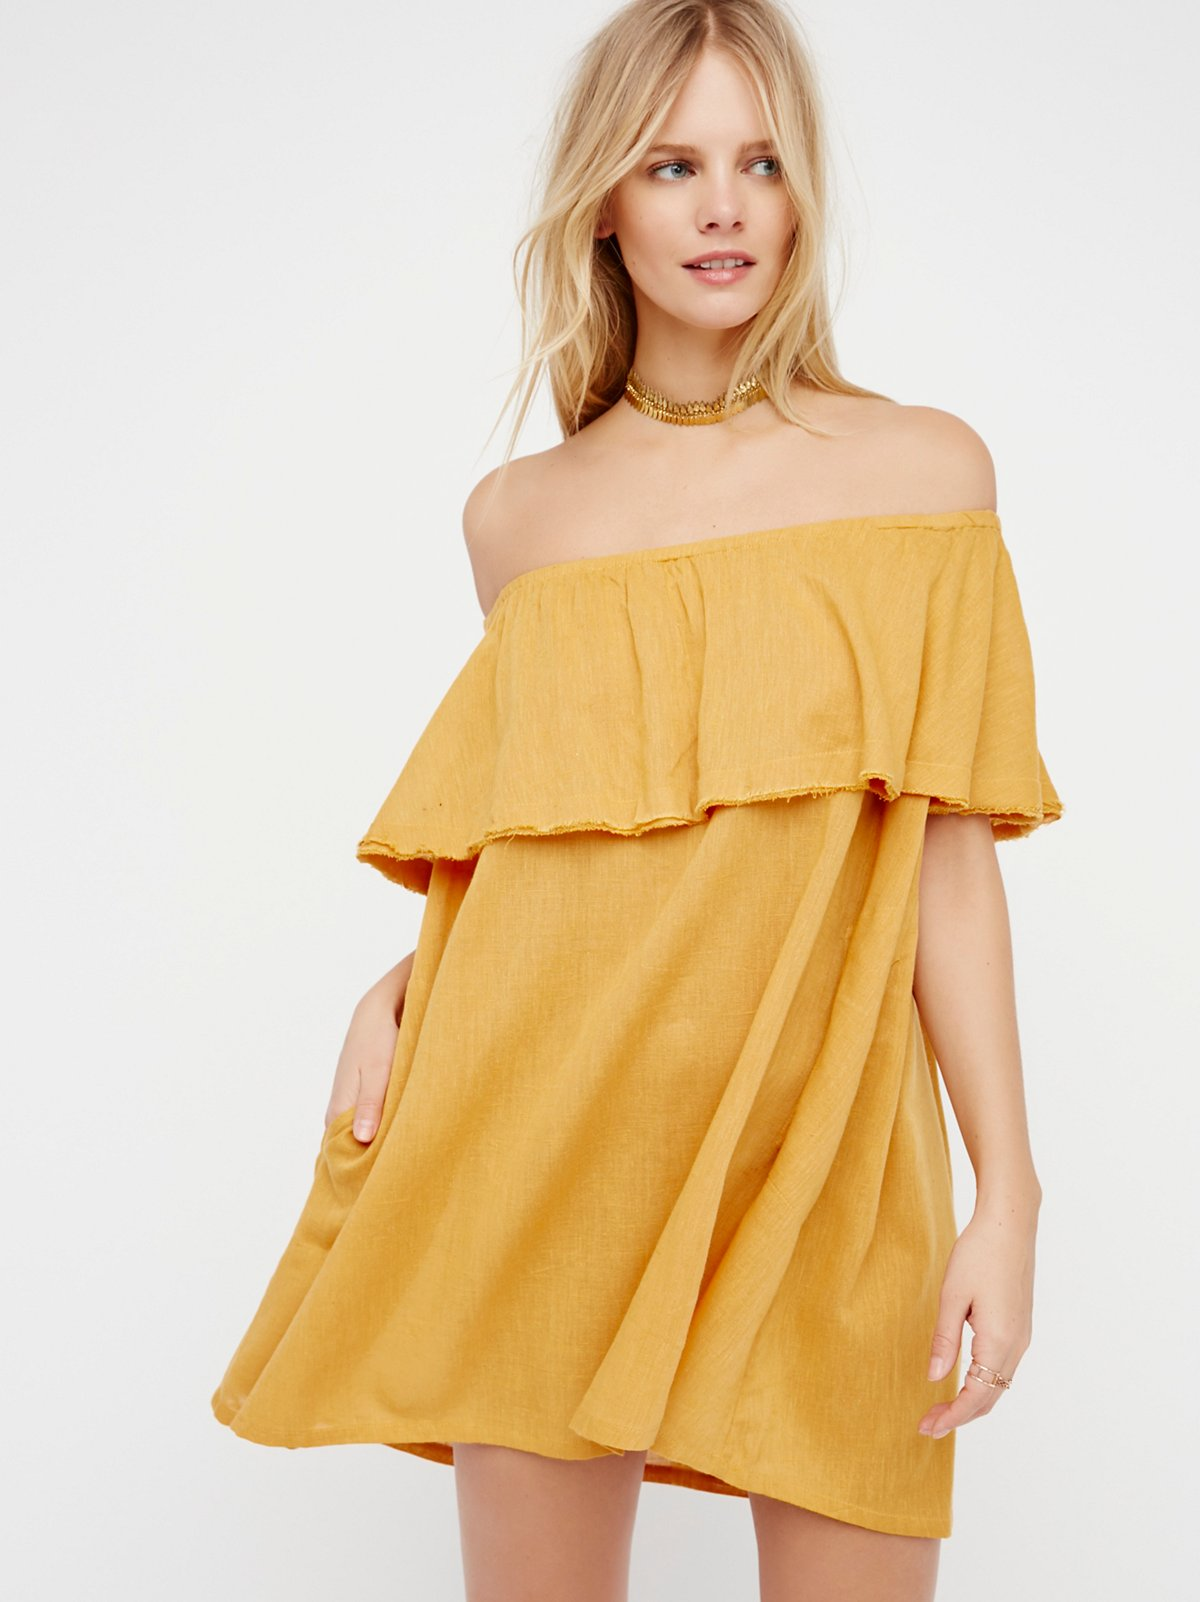 Serefina Off The Shoulder Dress